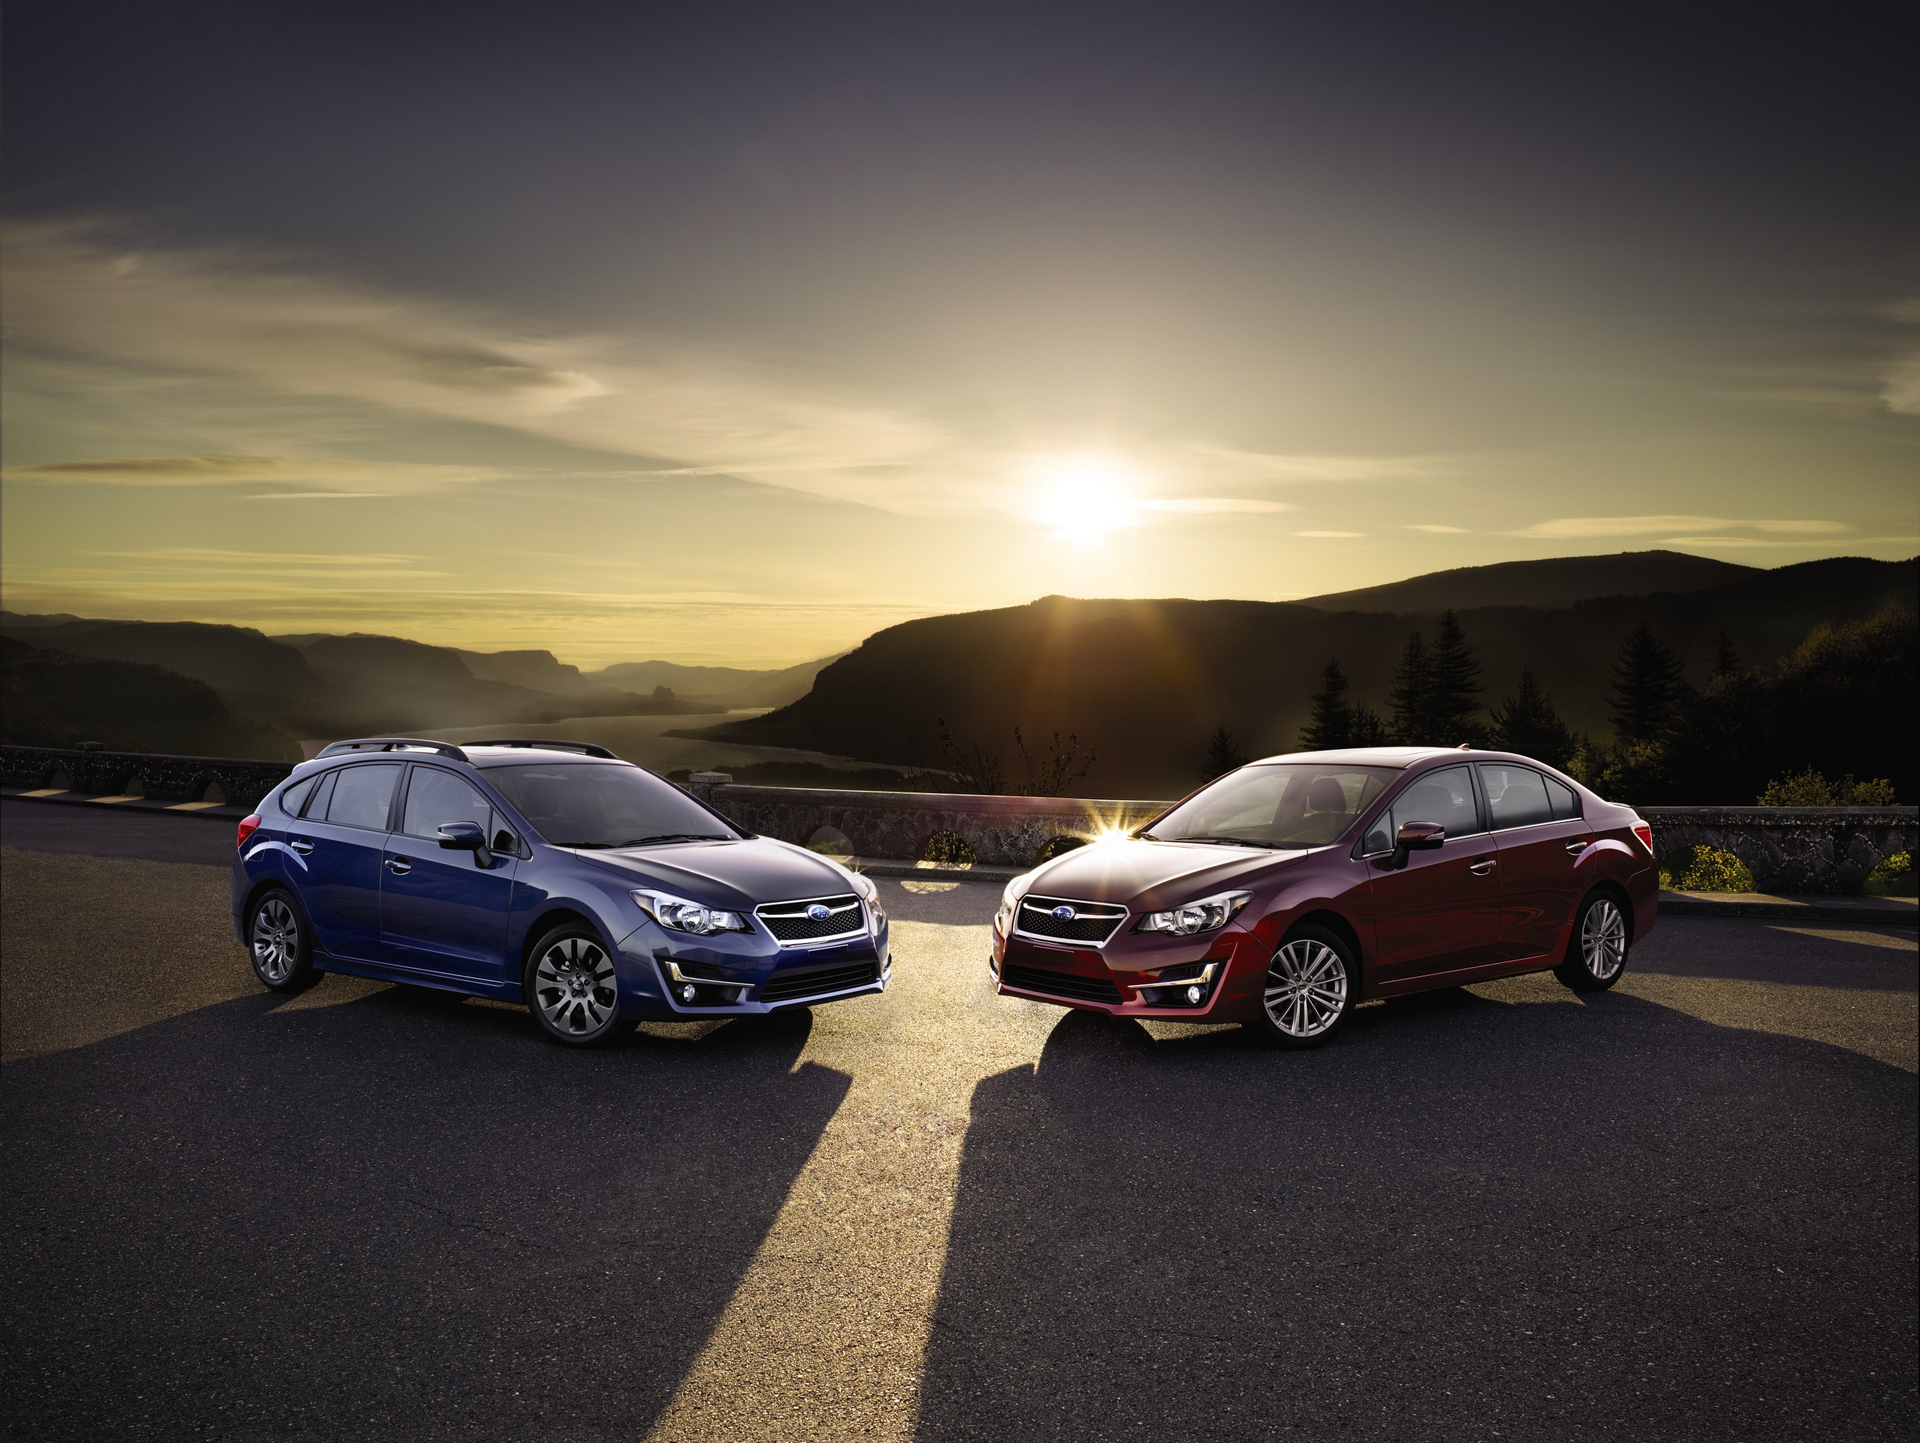 2016 Subaru Impreza © Fuji Heavy Industries, Ltd.